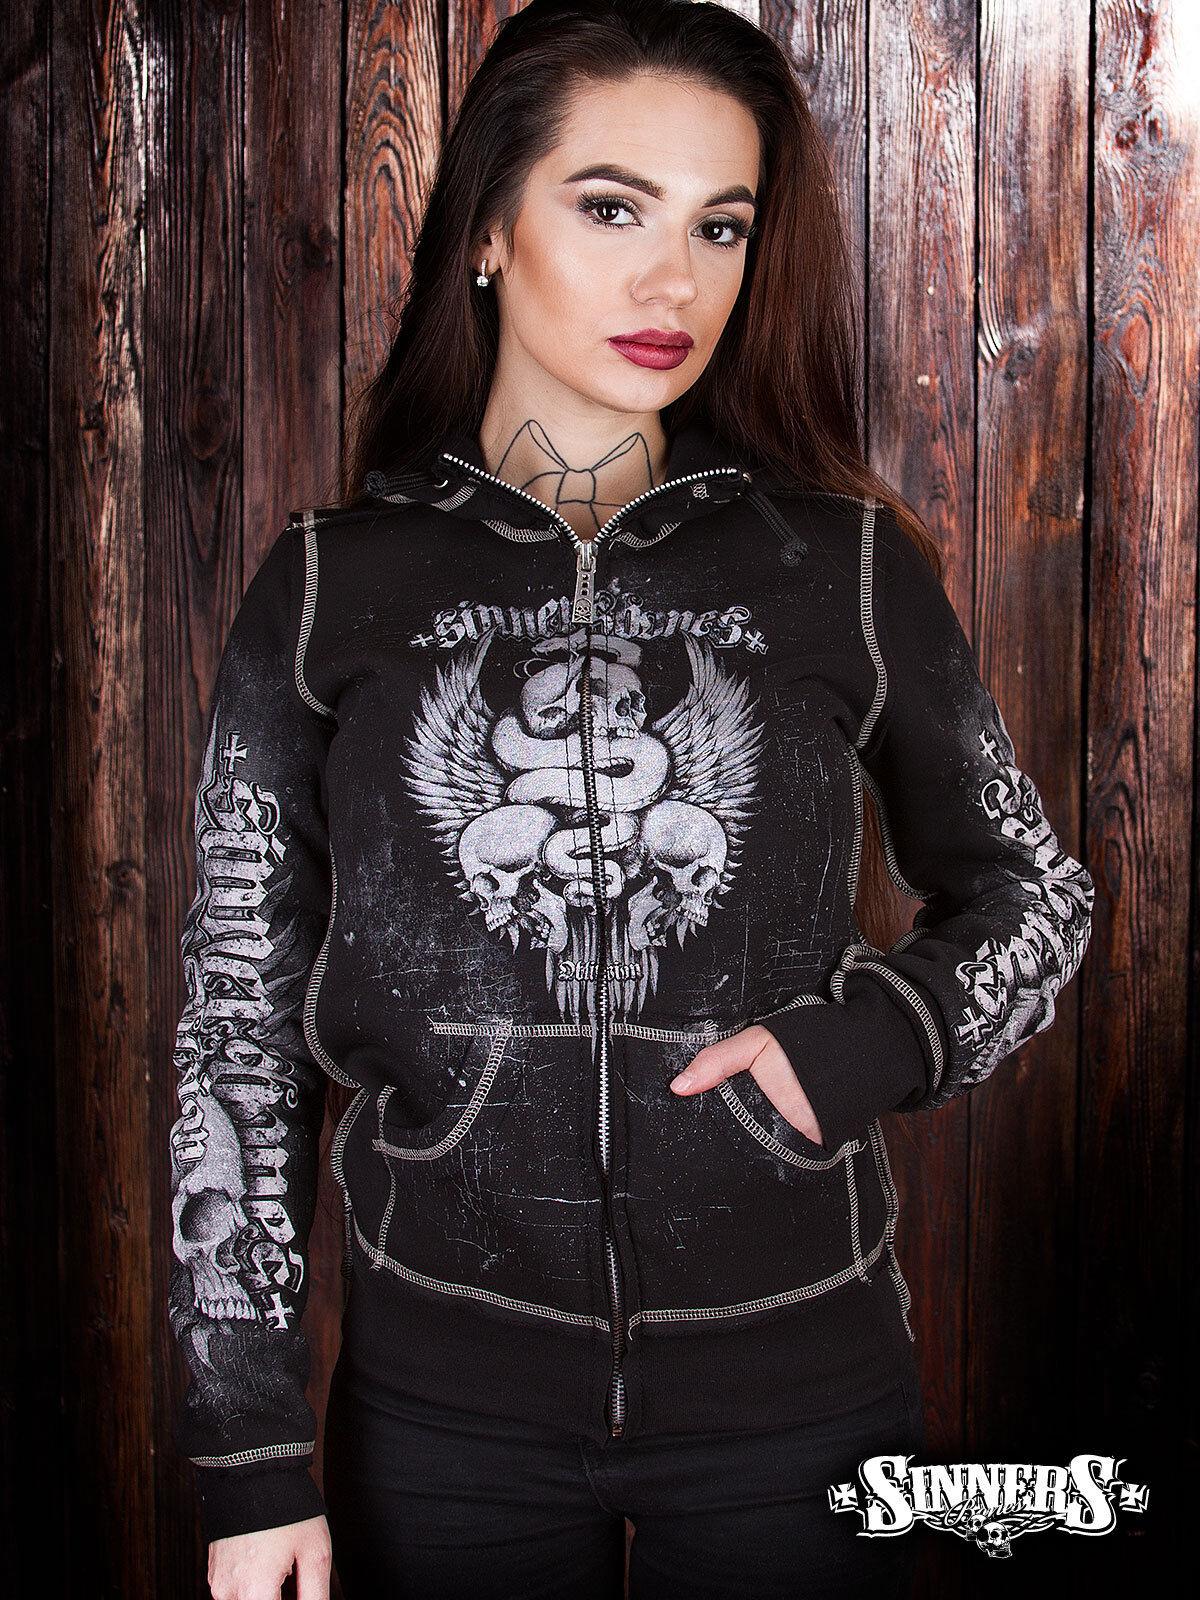 Women's Gothic Harley Davidson Bikers Hoodie